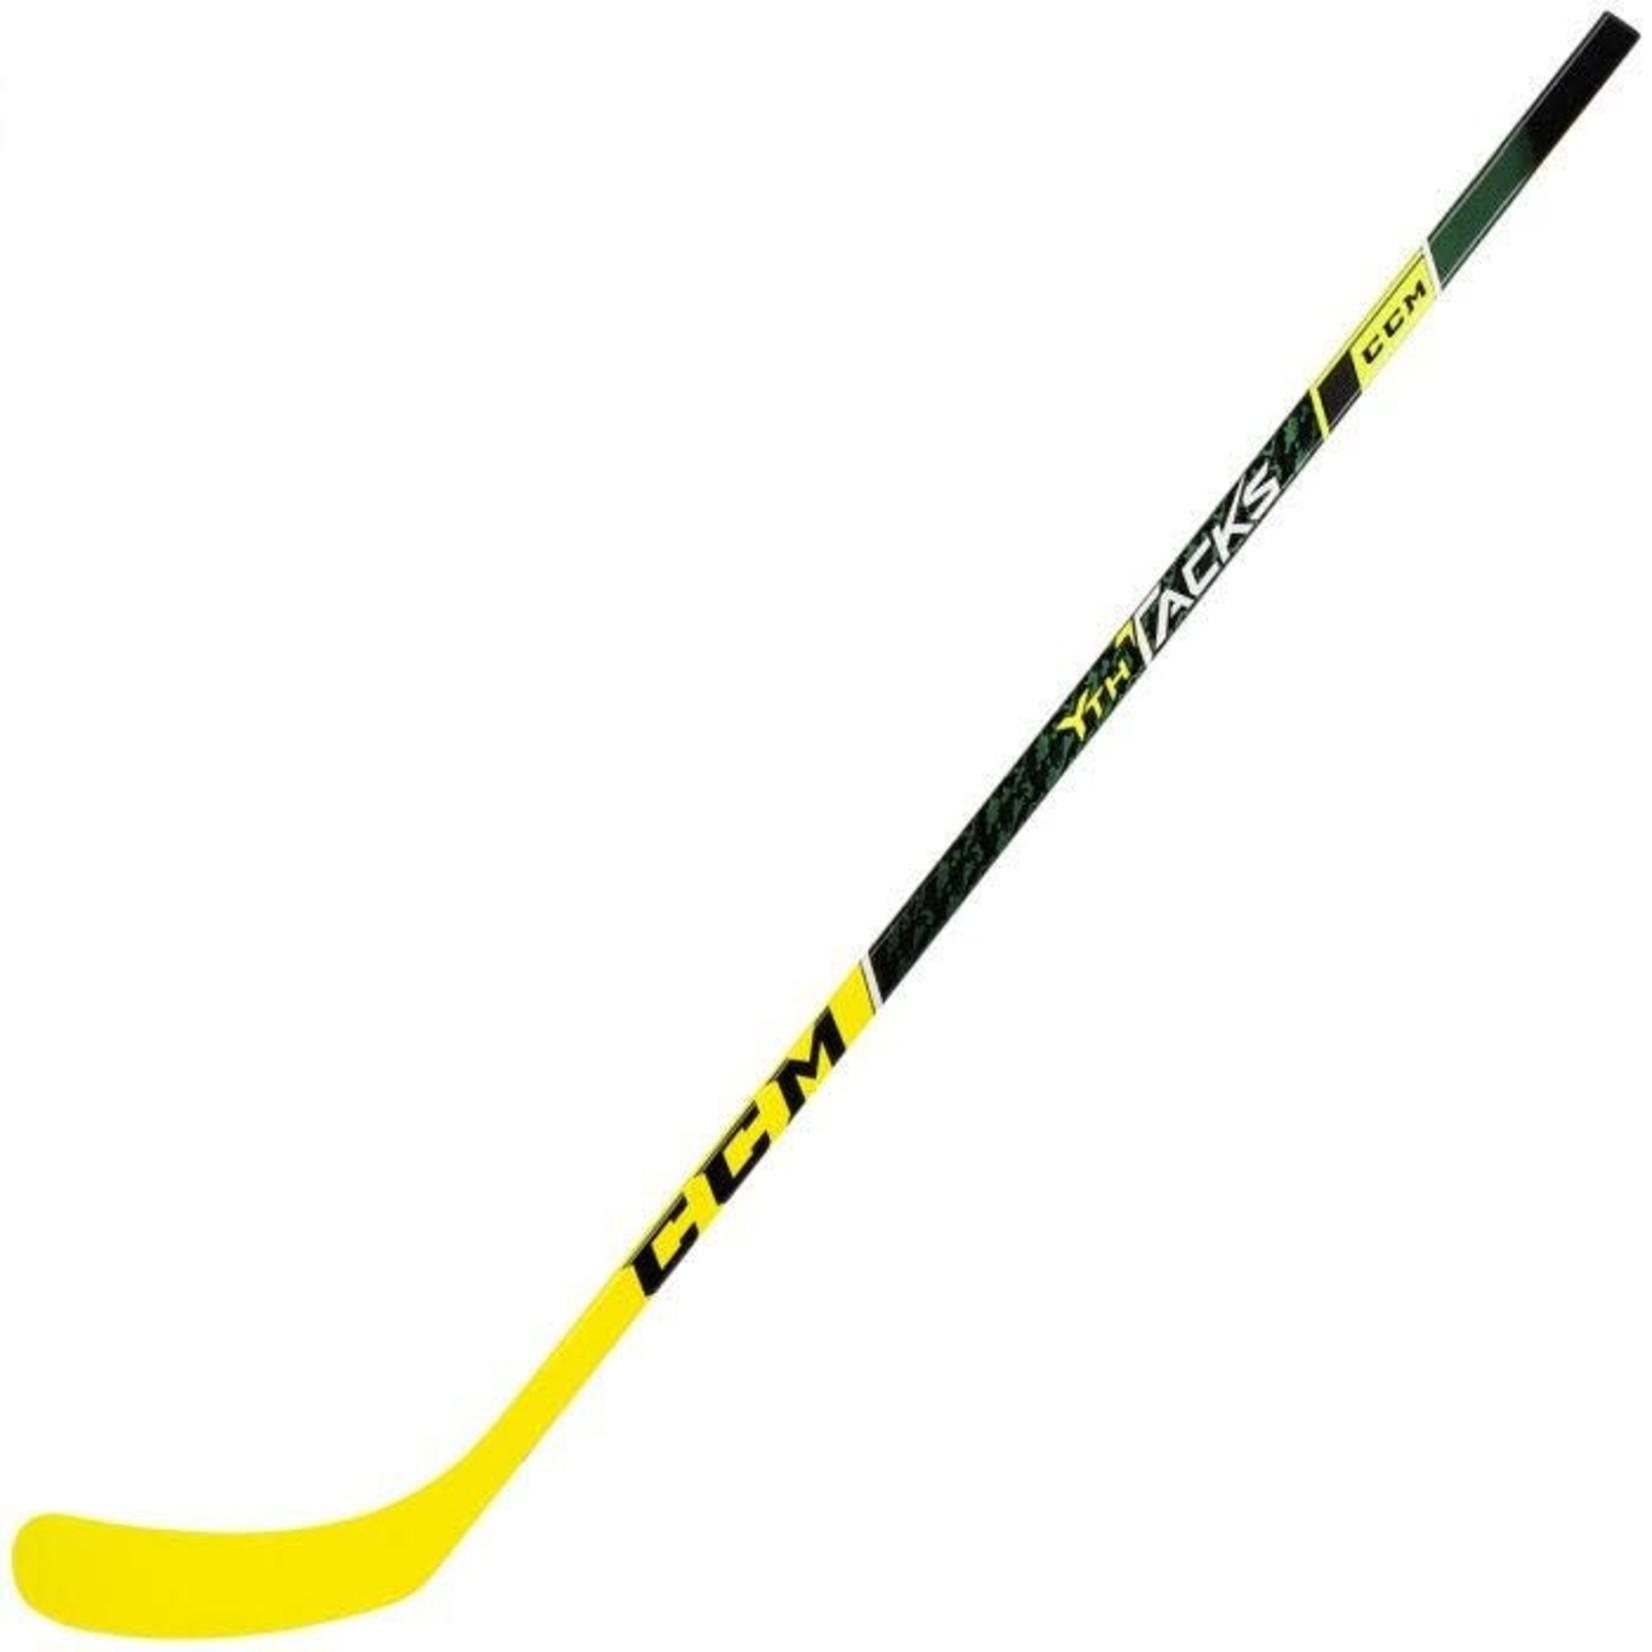 CCM CCM Hockey Stick, Tacks, Youth, Grip